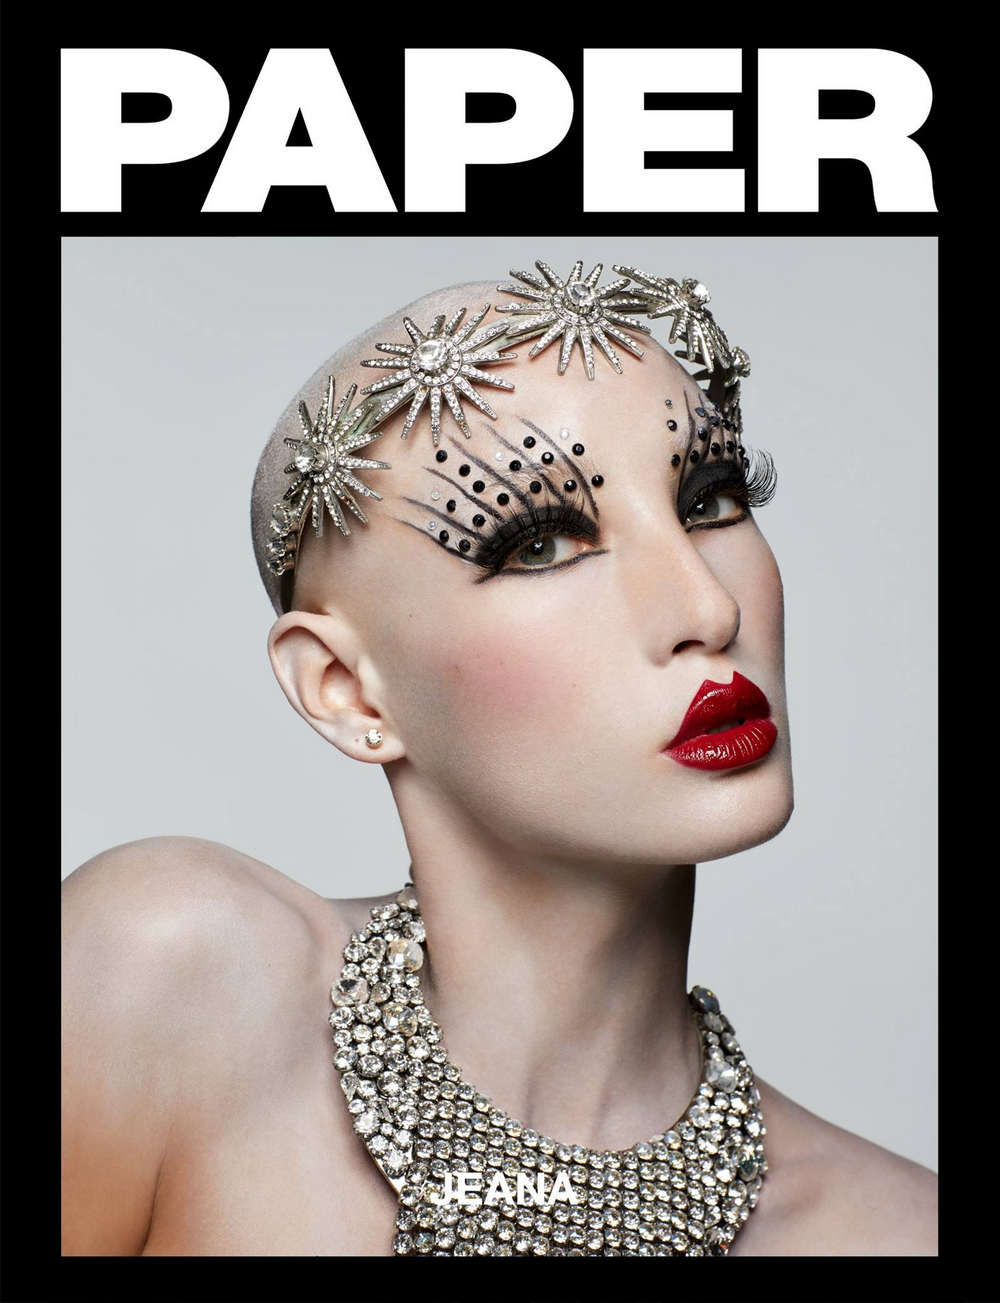 Episode 10 Photoshoot: PAPER Magazine Cover